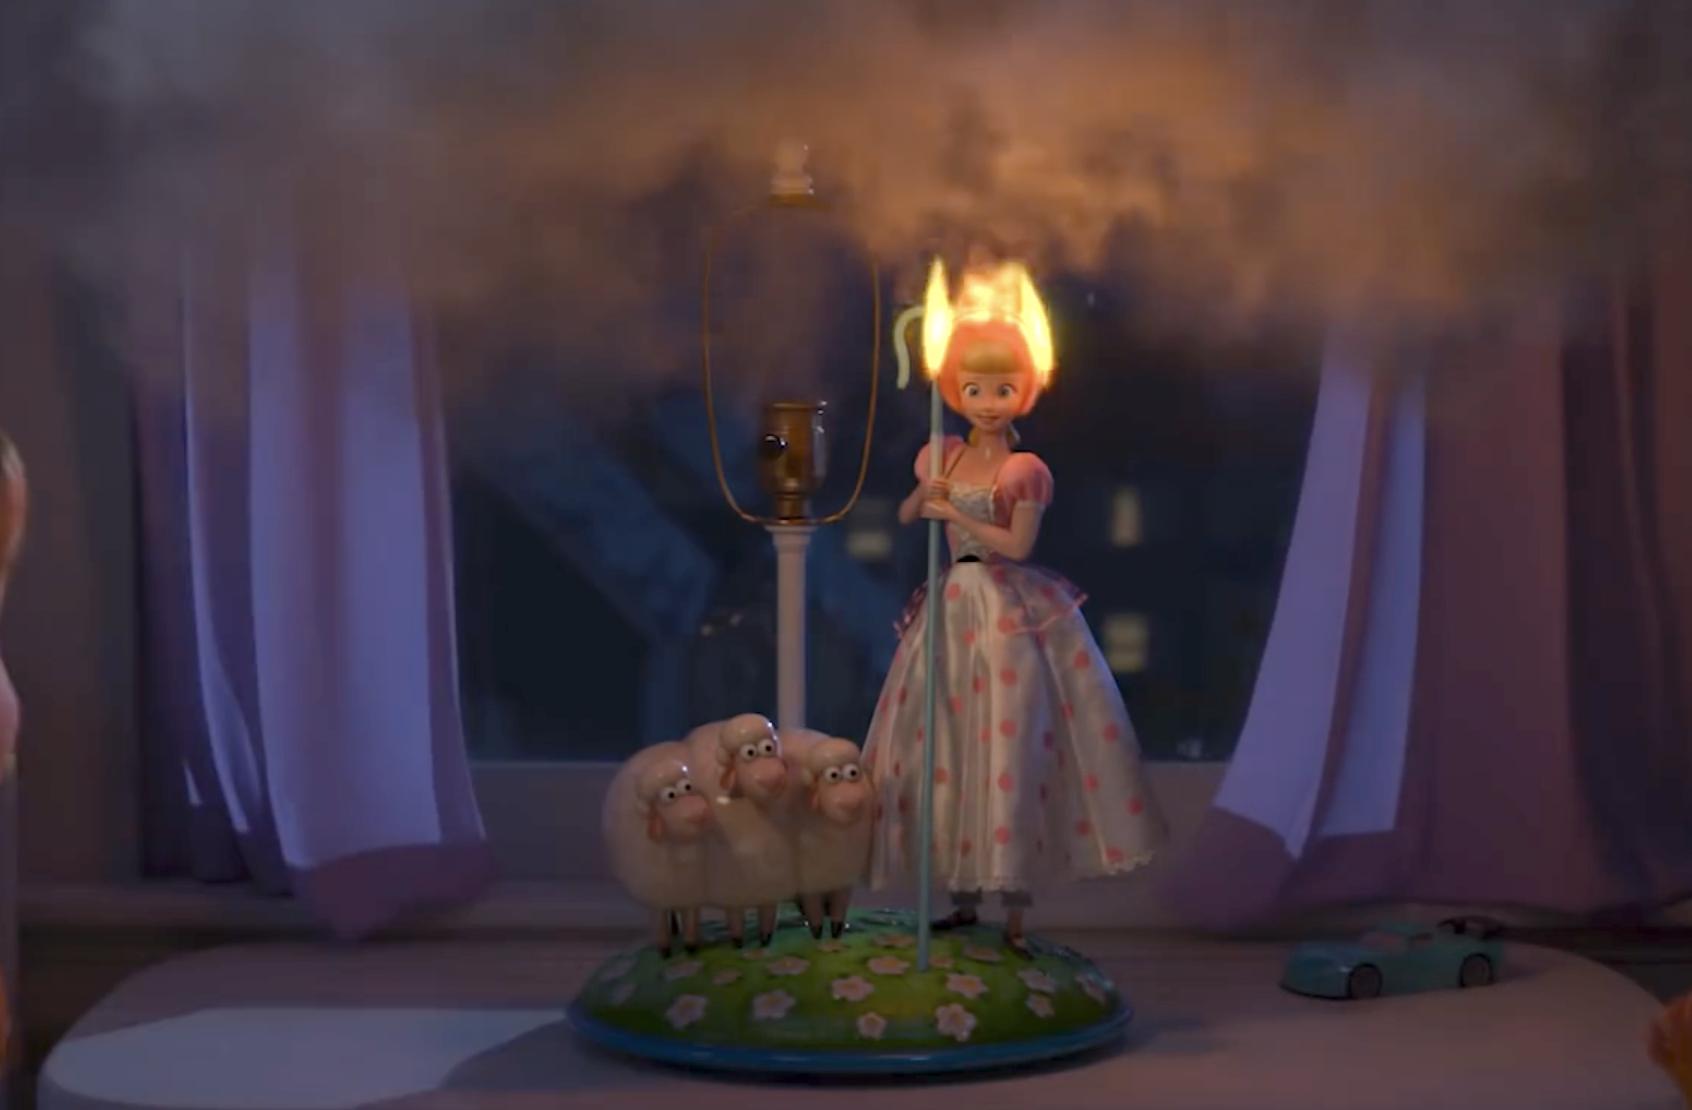 bo peep is on FIRE in Lamp Life